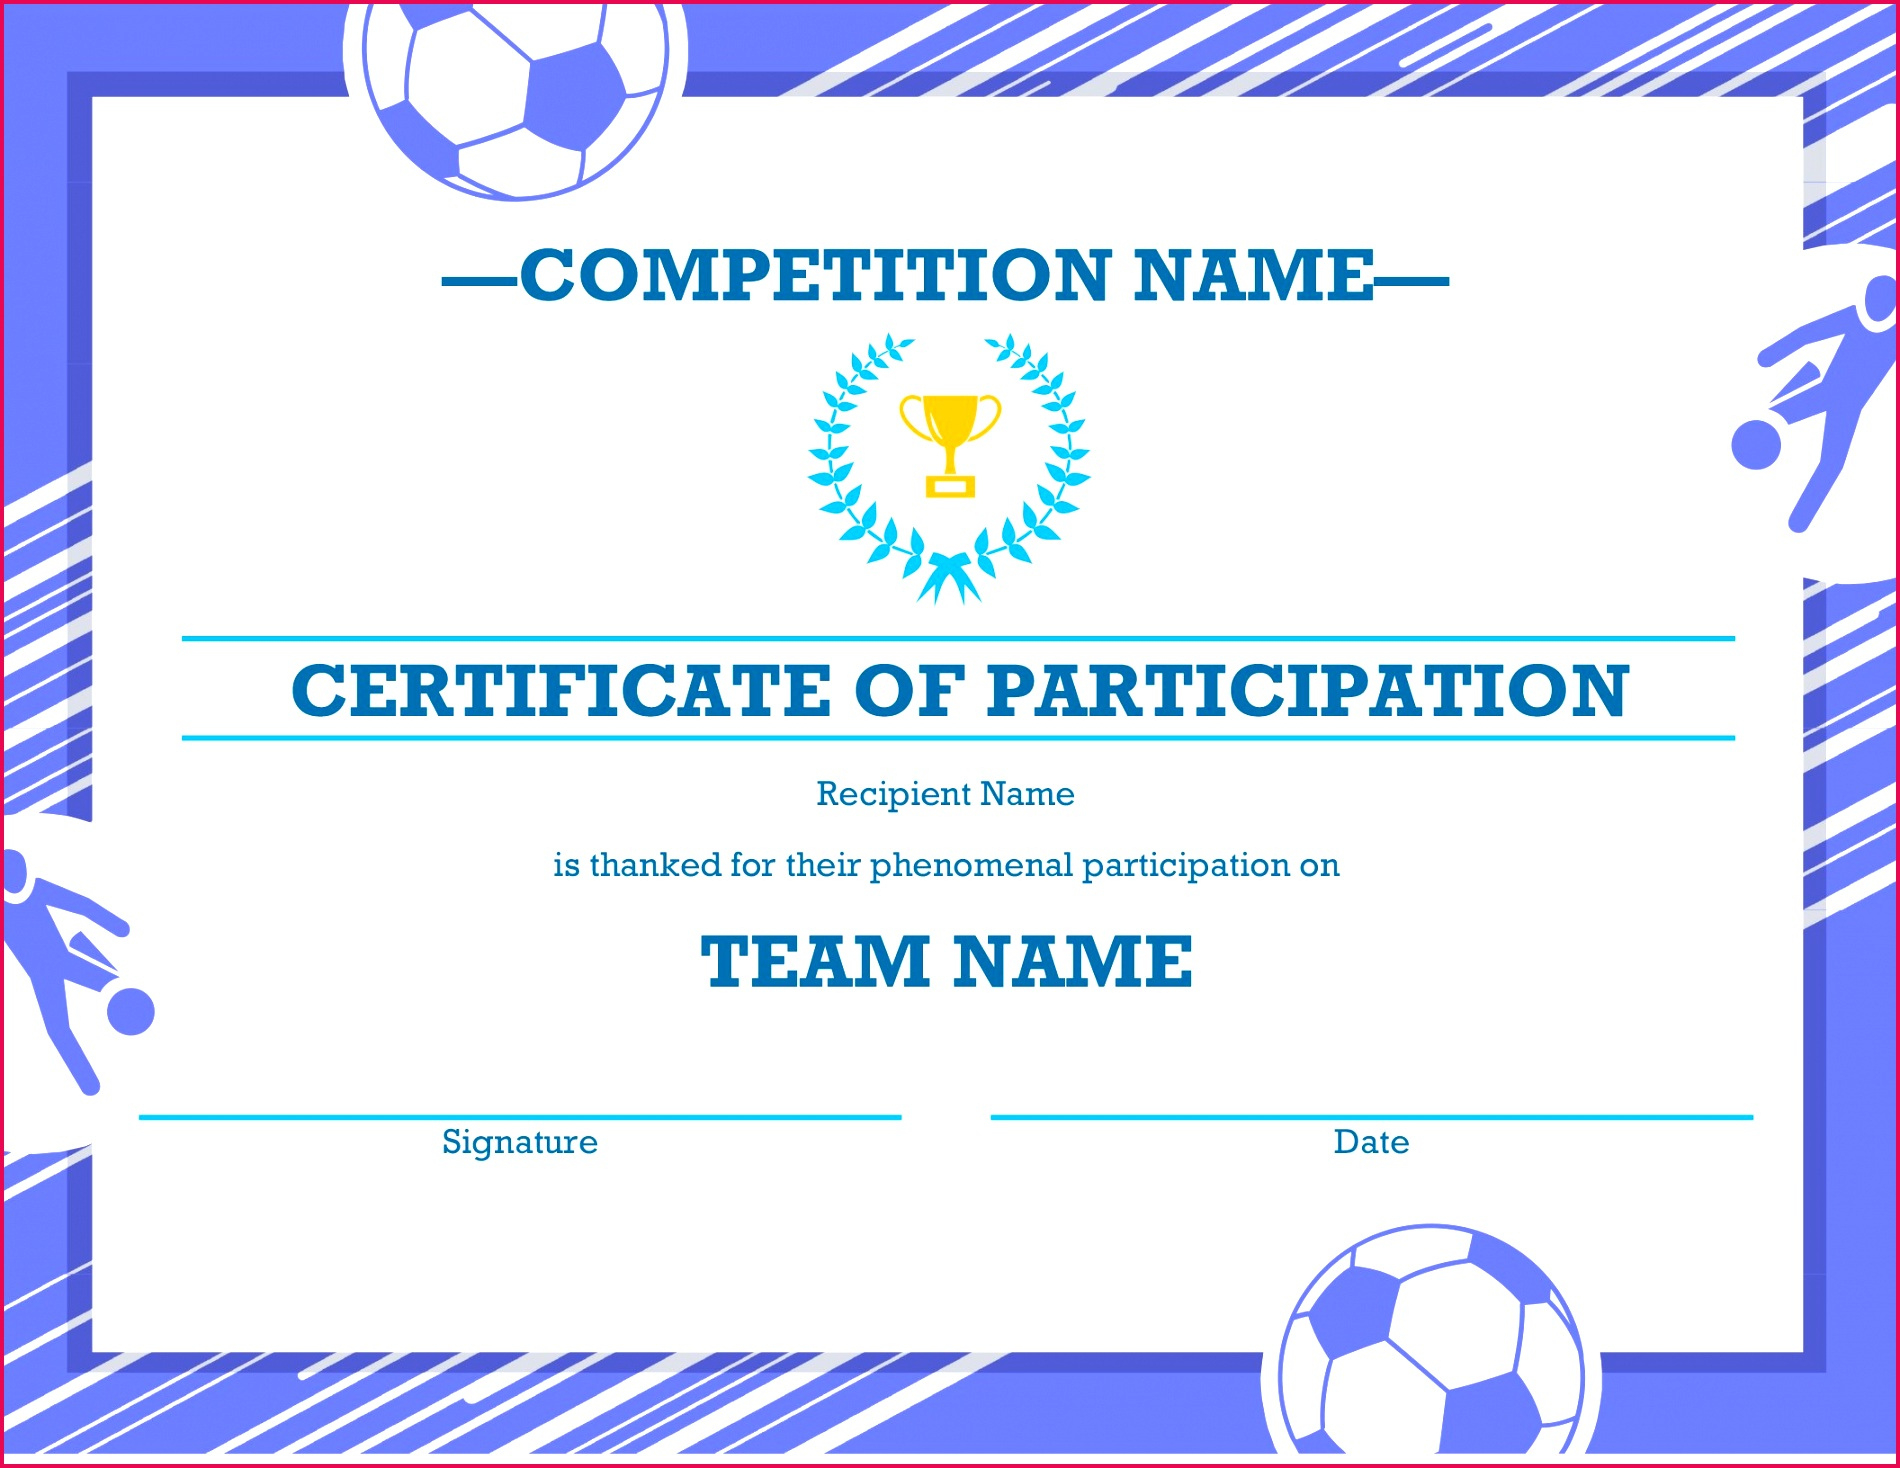 4 Employee Star Award Certificate Templates 25559 intended for Quality Star Student Certificate Templates